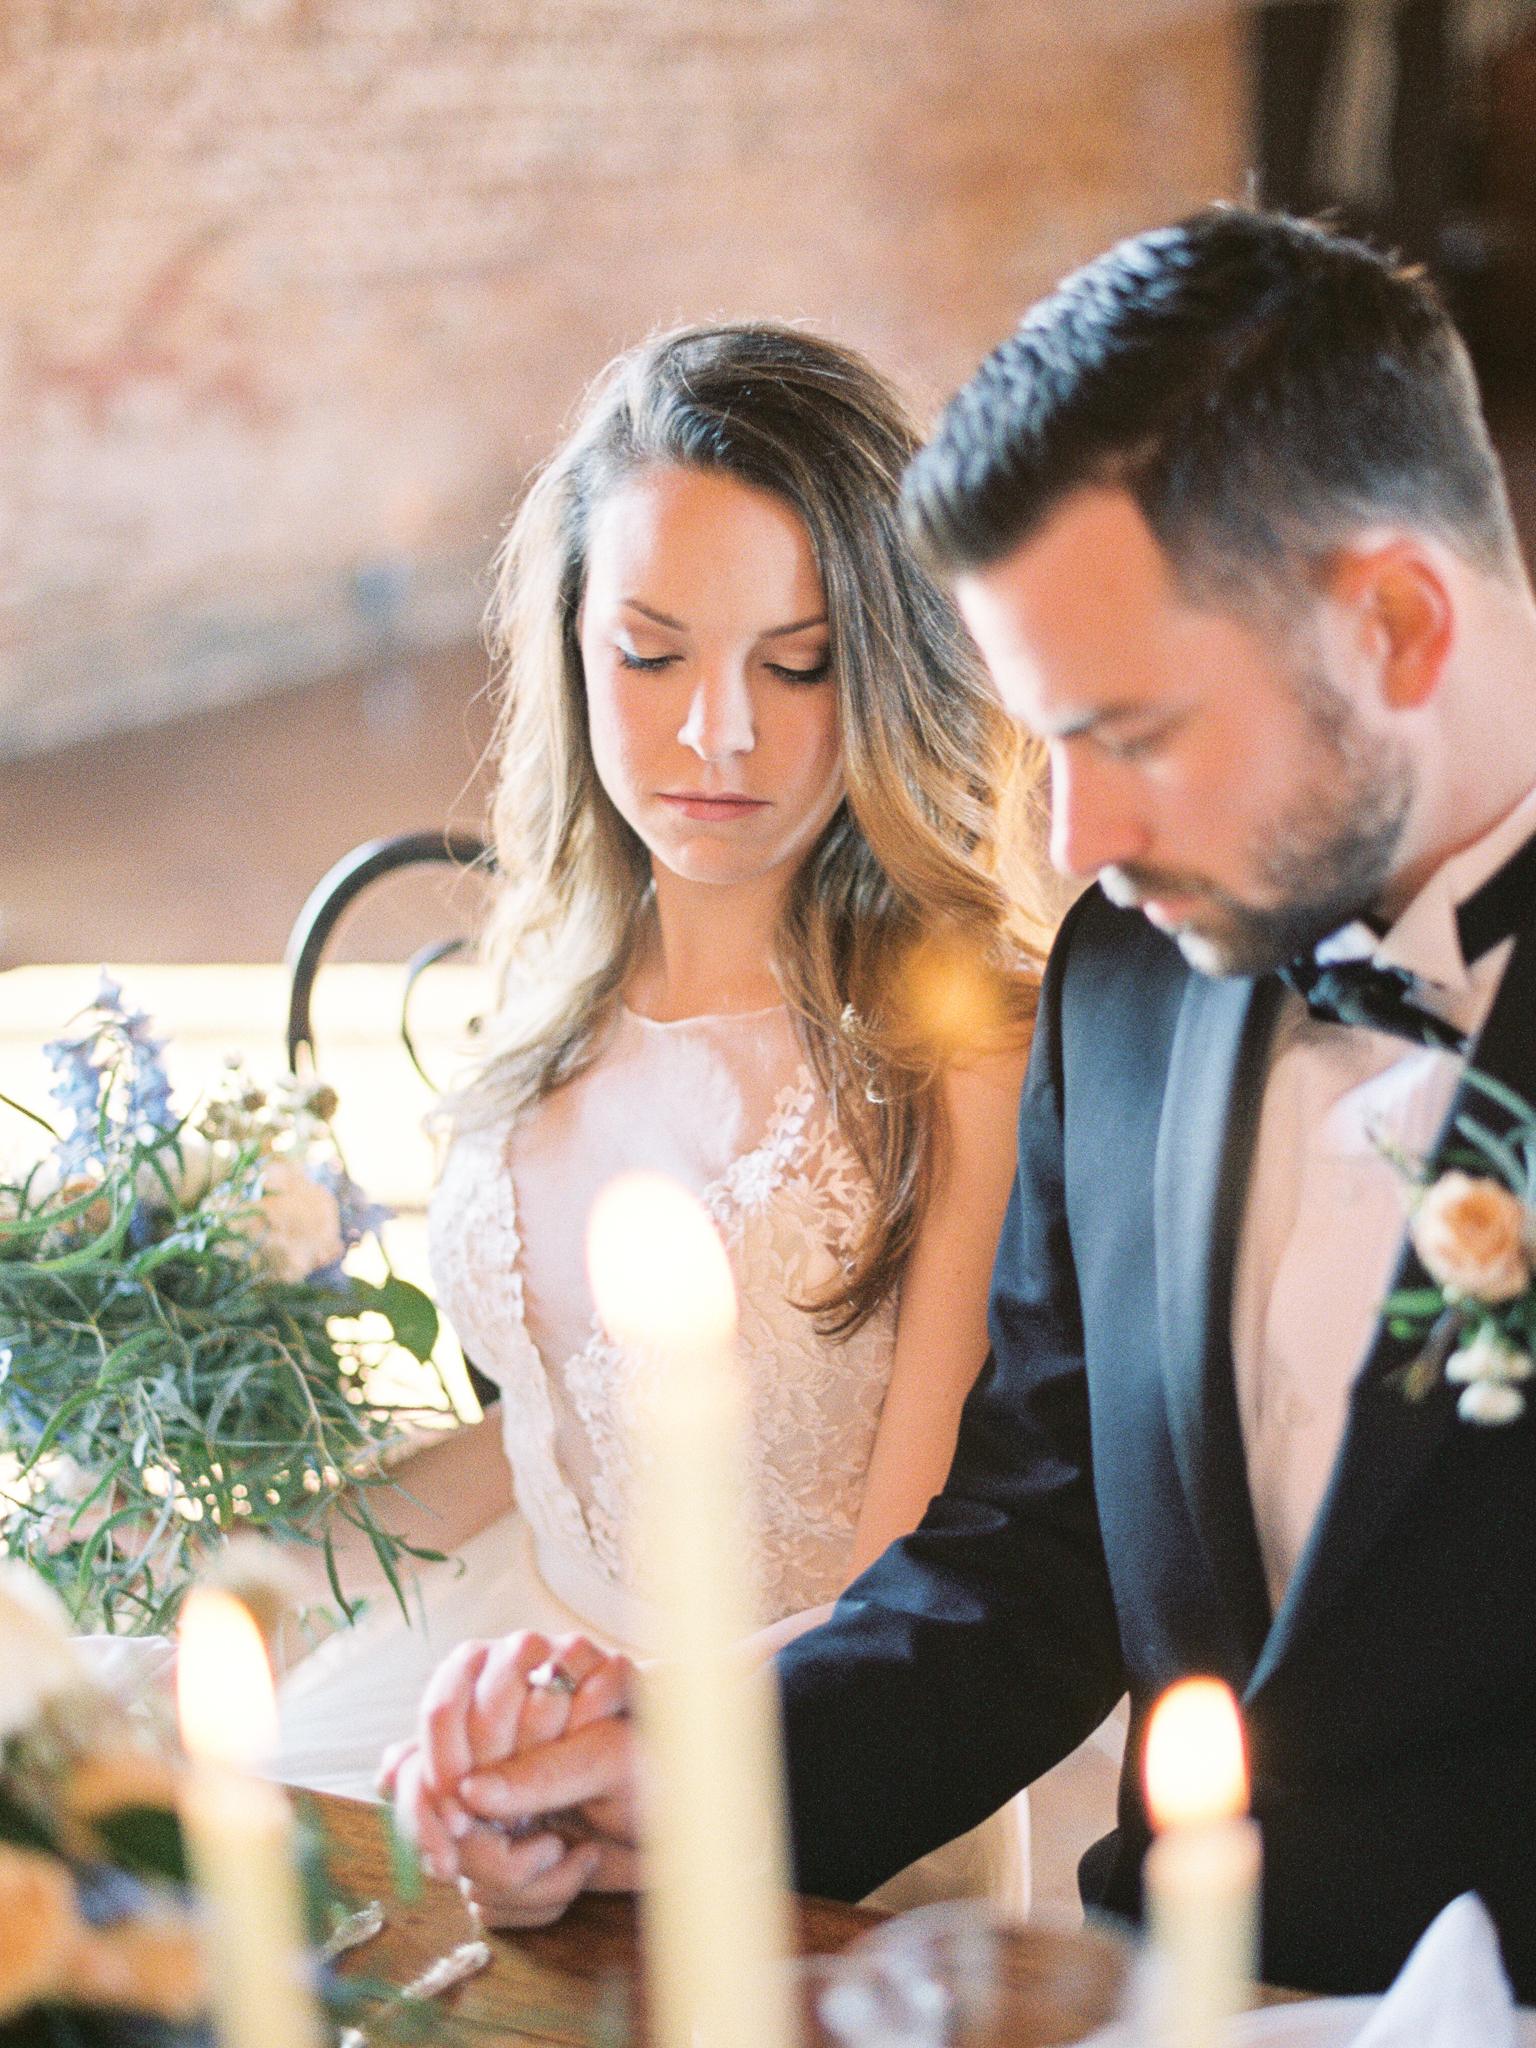 christinadavis+weddinginspiration30.jpg